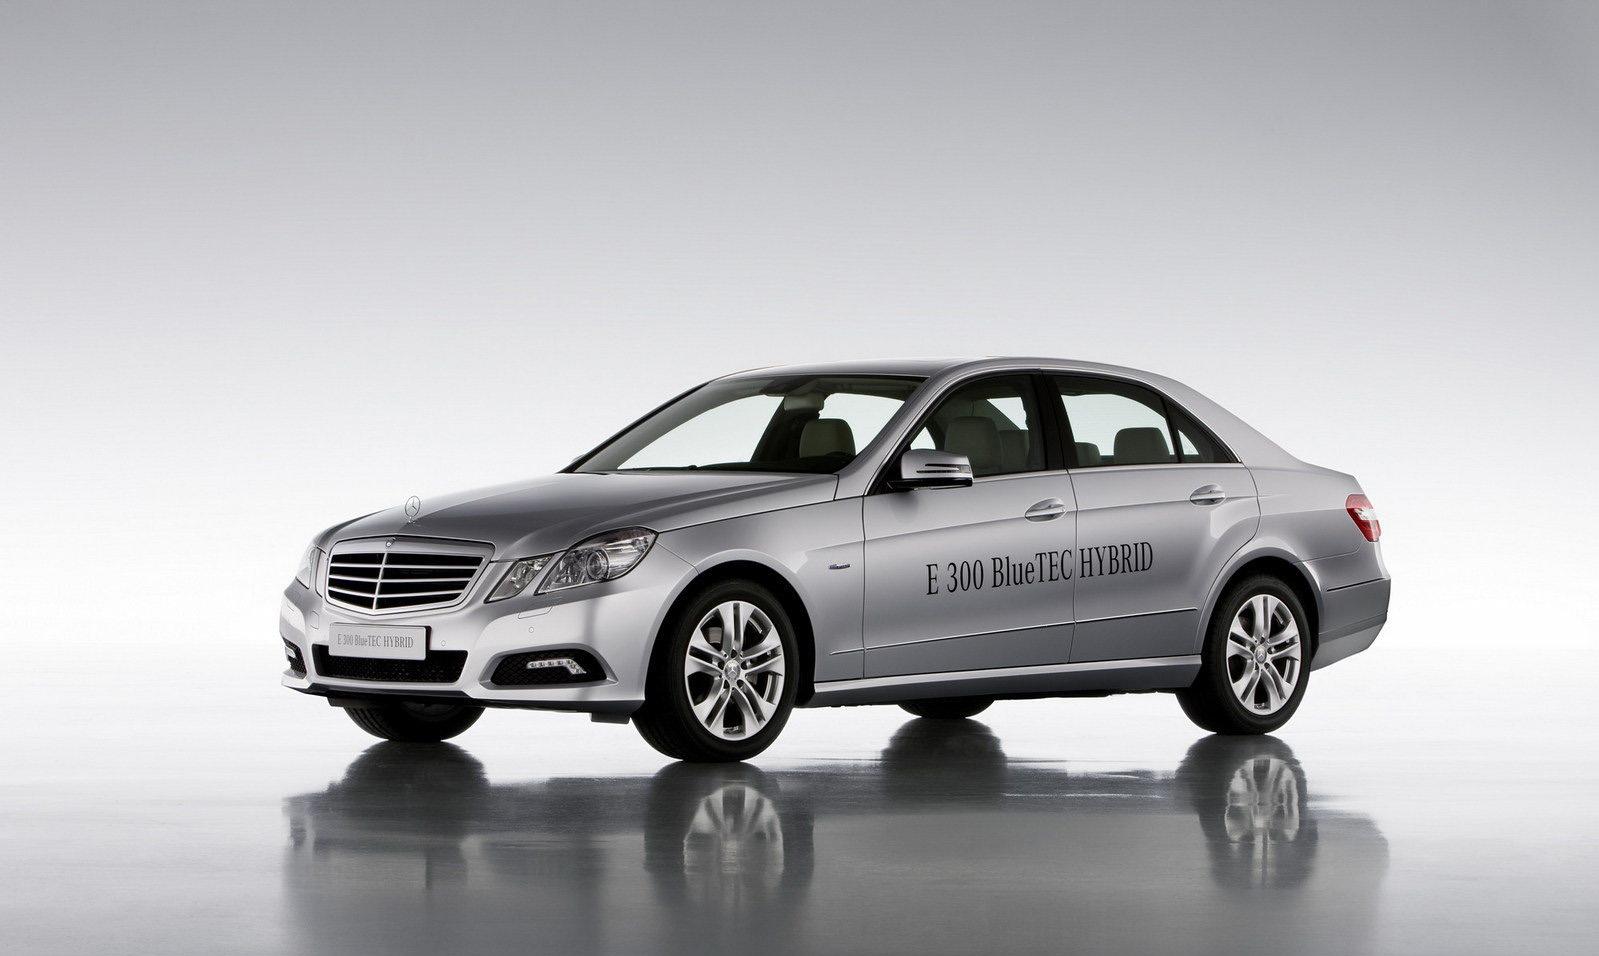 Mercedes benz e 300 hybrid technical details history for Mercedes benz e300 hybrid